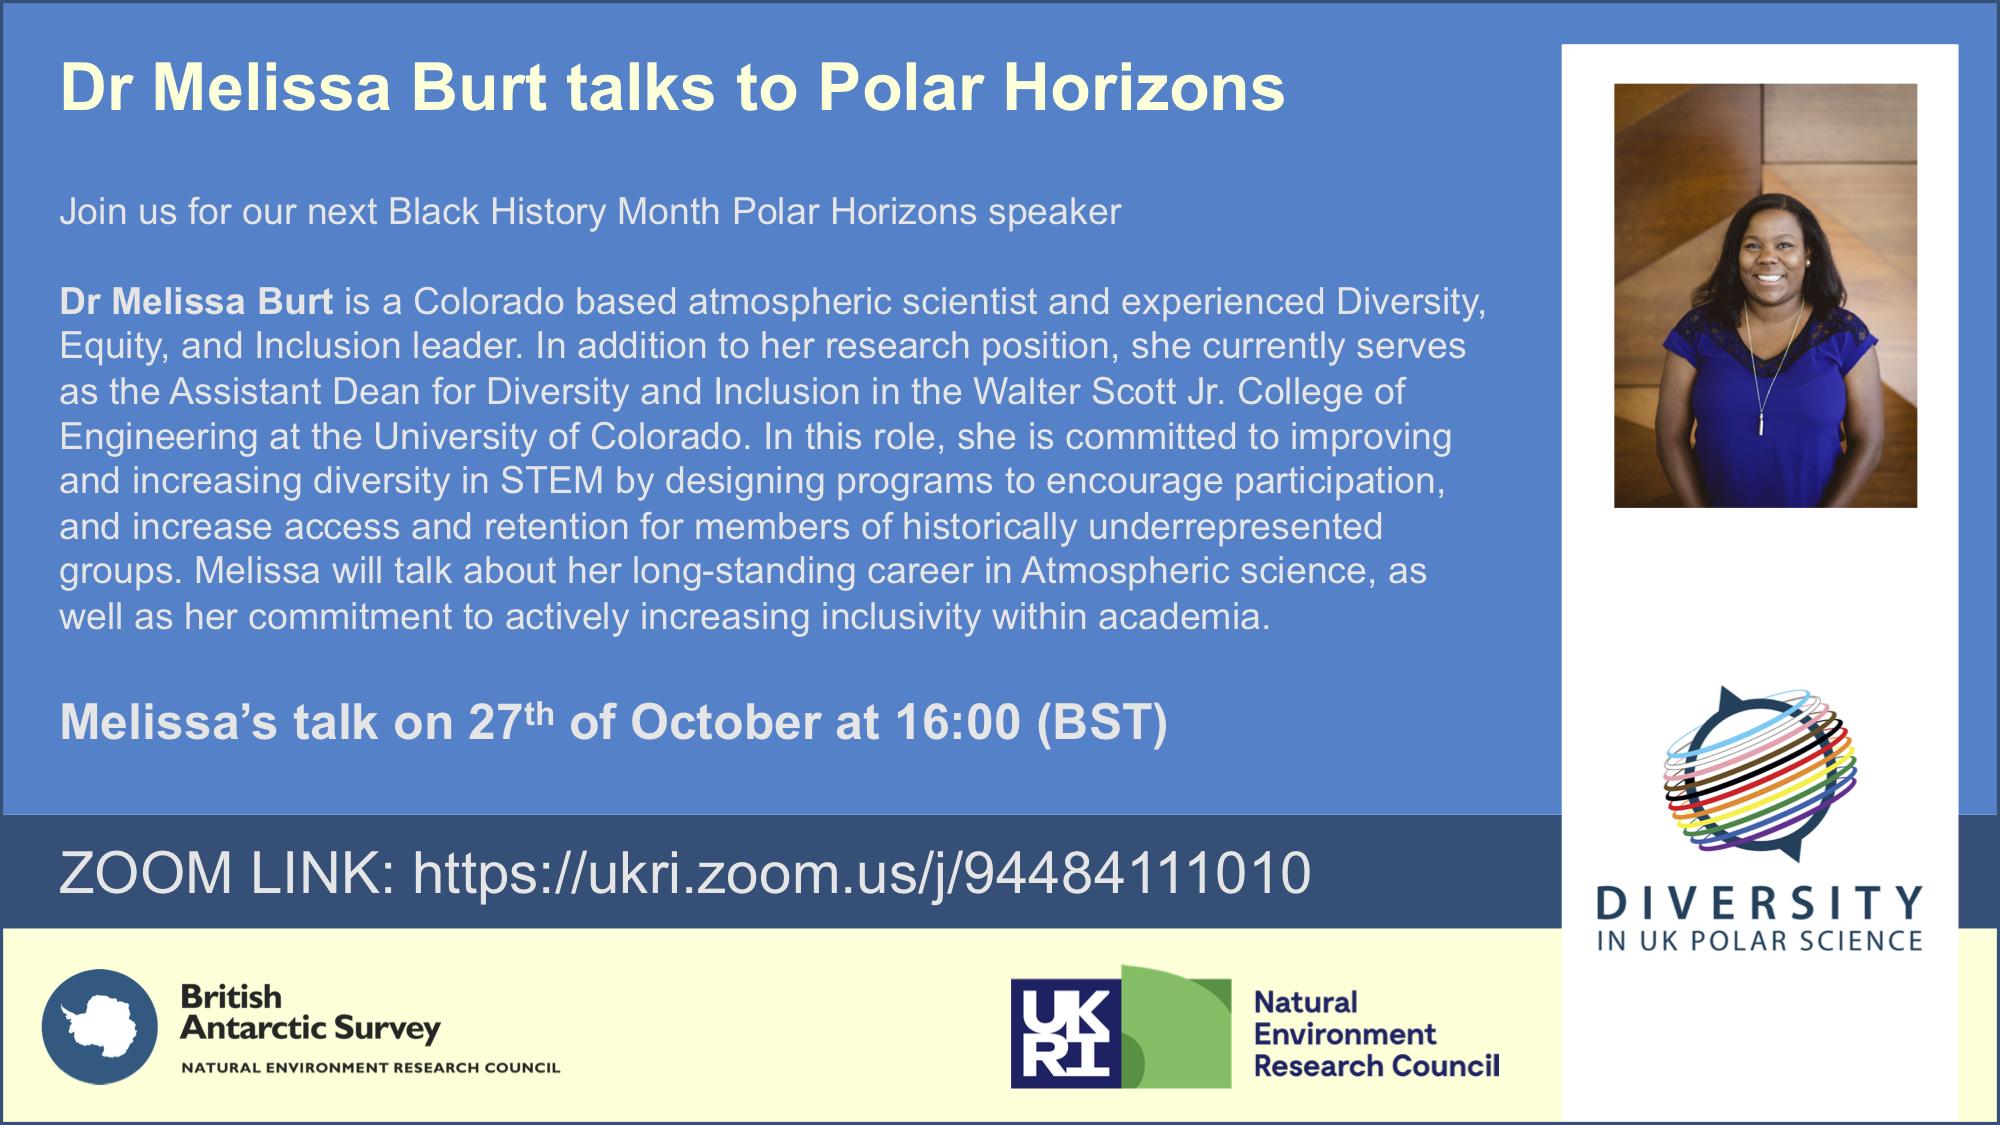 Talk poster with information on speaker Dr Melissa Burt